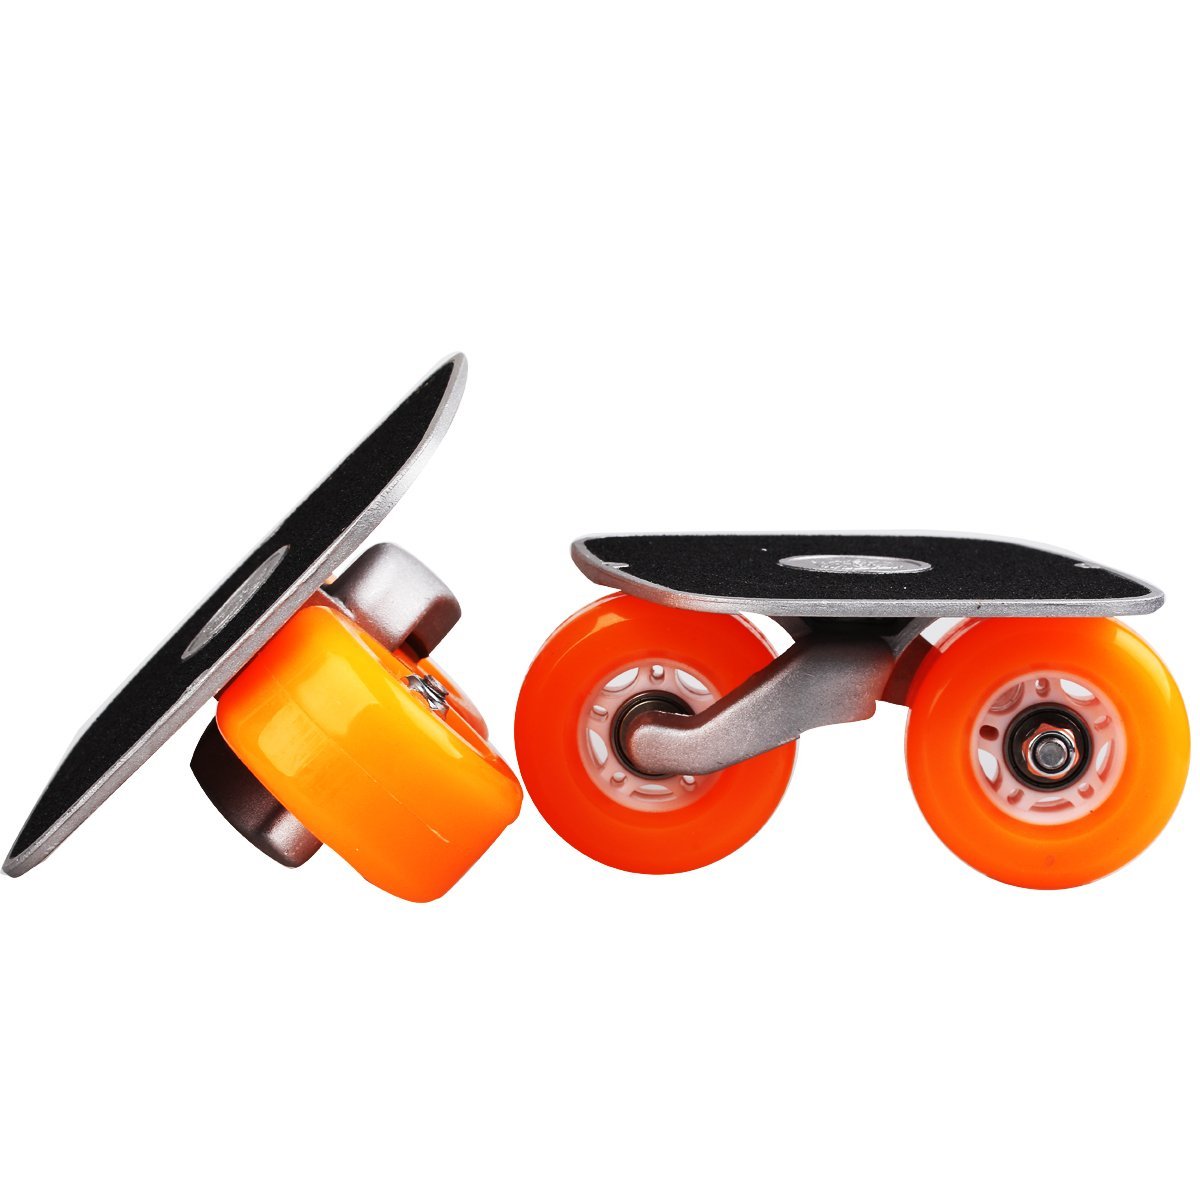 JINCAO Orange Portable Roller Road Drift Skates Plate Anti-Slip Board Aluminum Truck with PU Wheels with ABEC-7 608 Bearings by JINCAO